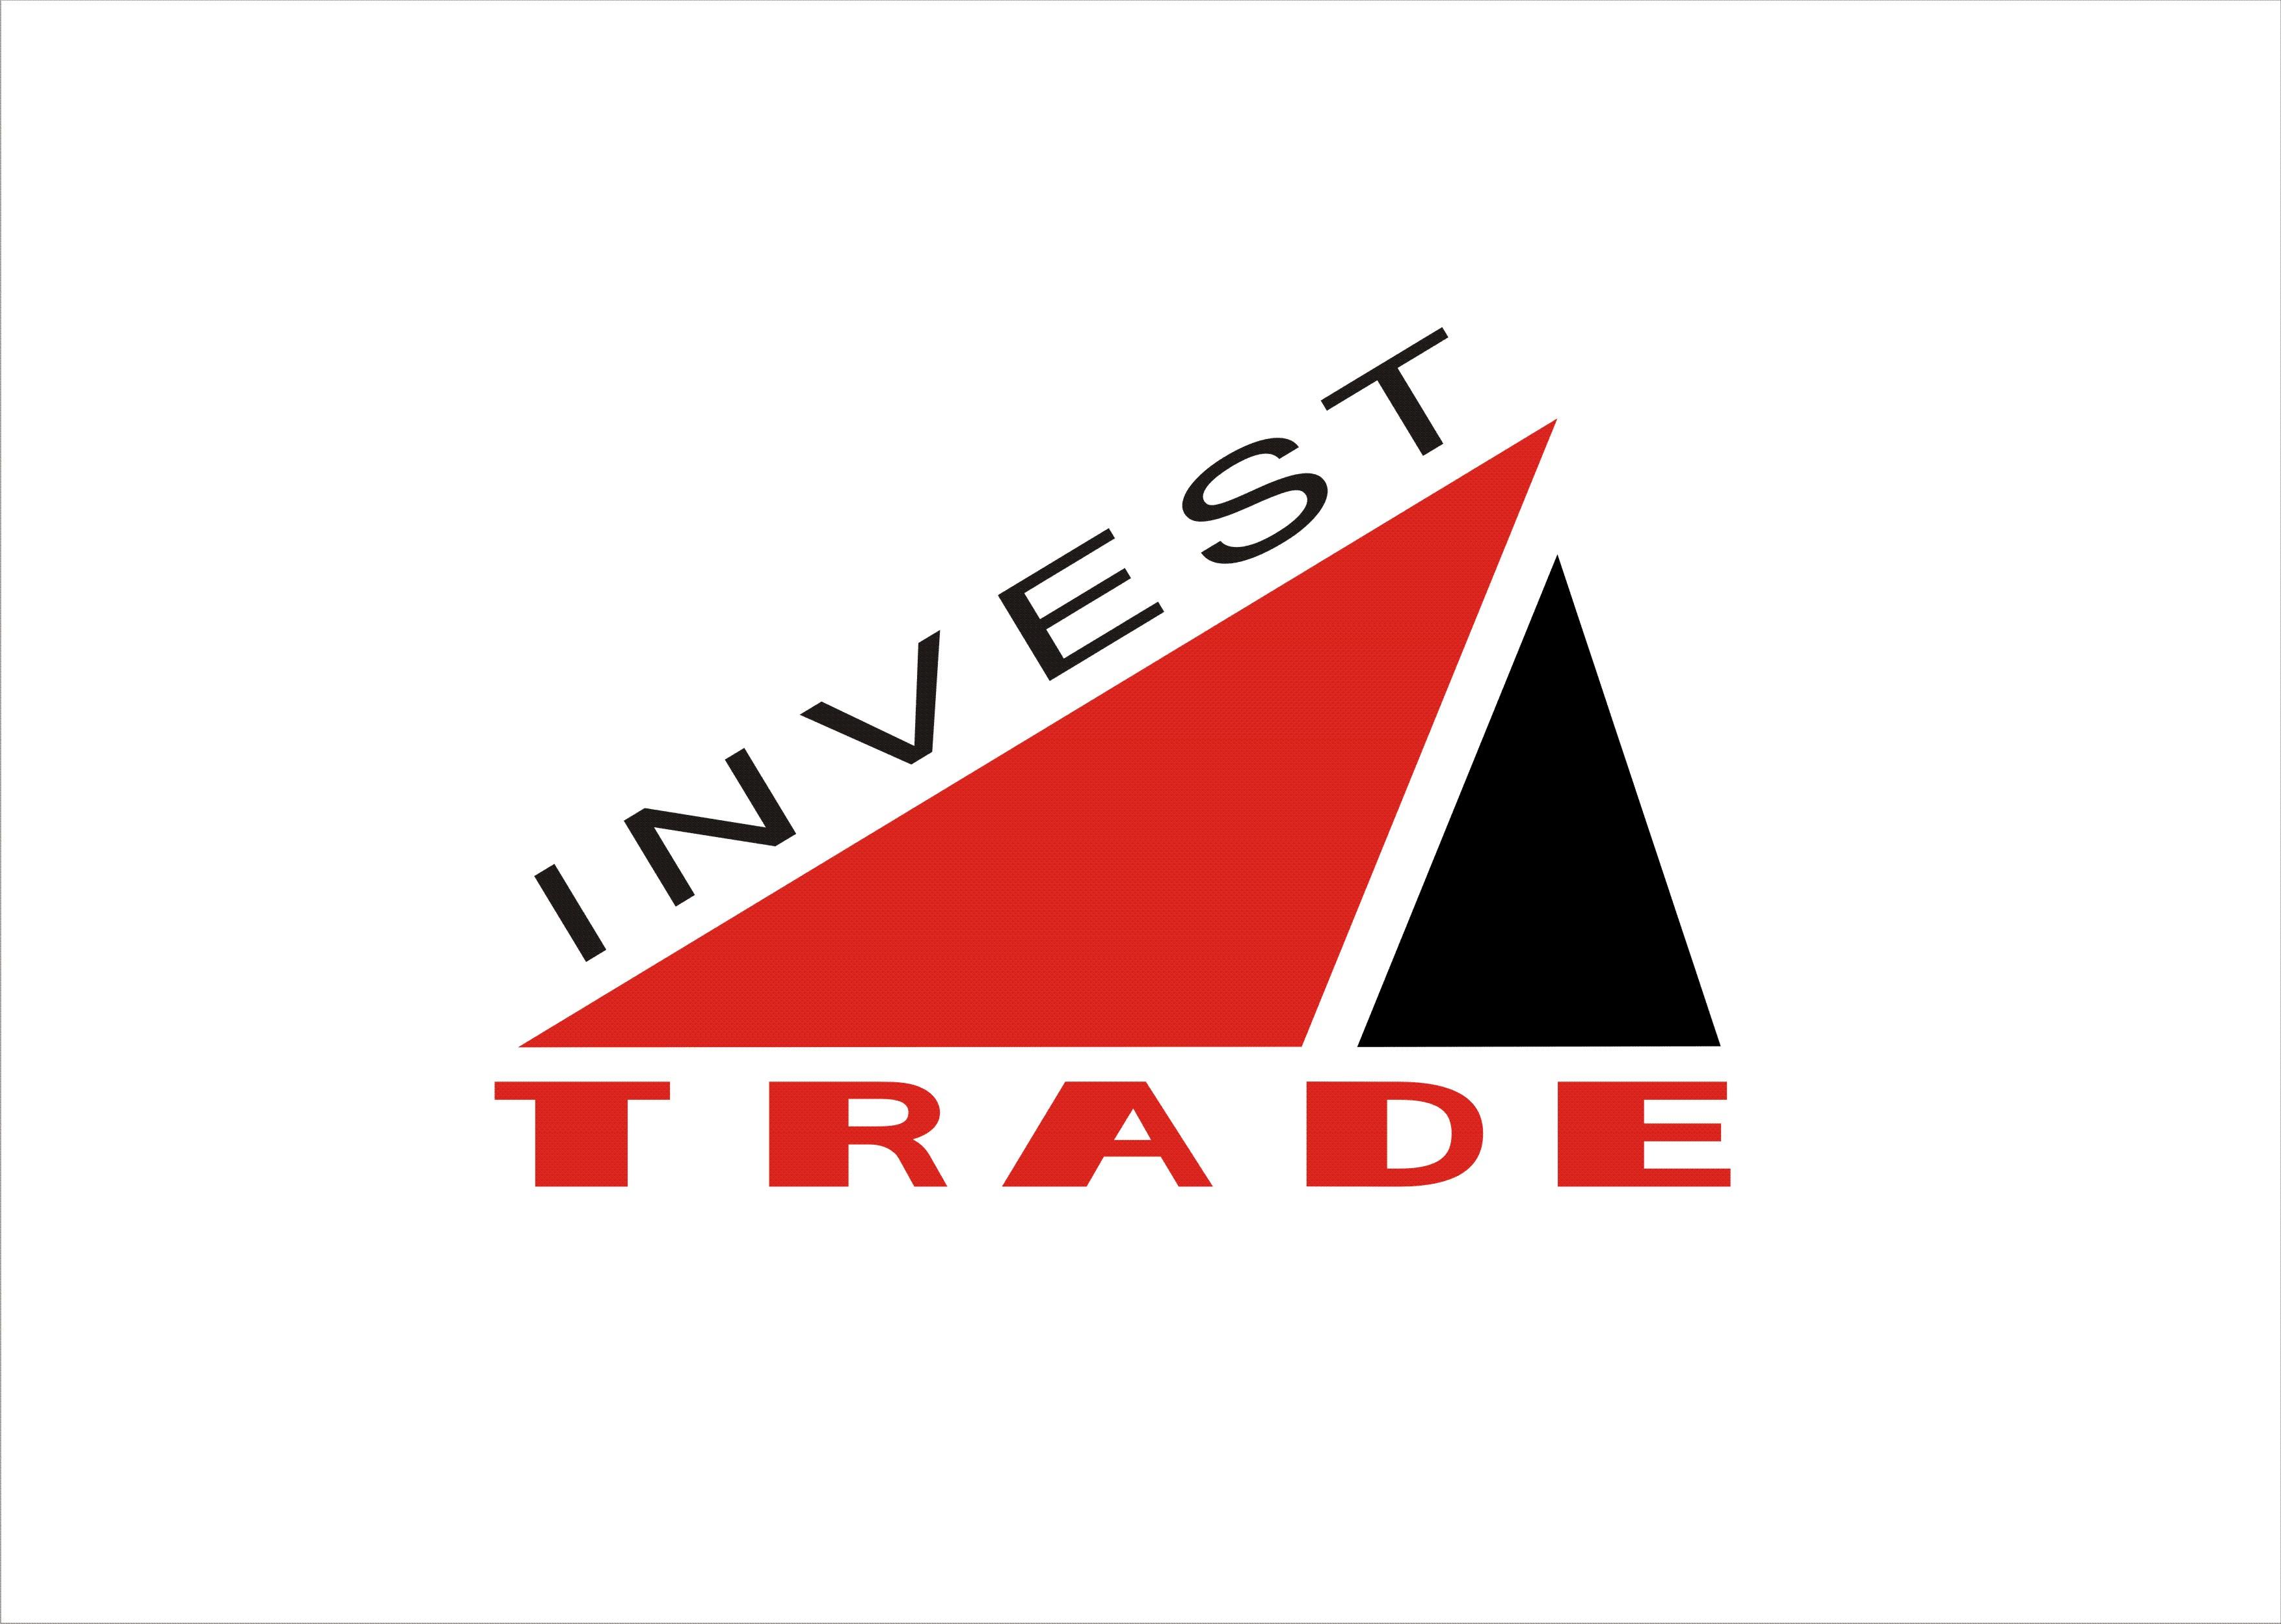 Разработка логотипа для компании Invest trade фото f_19551240458ebd3f.jpg